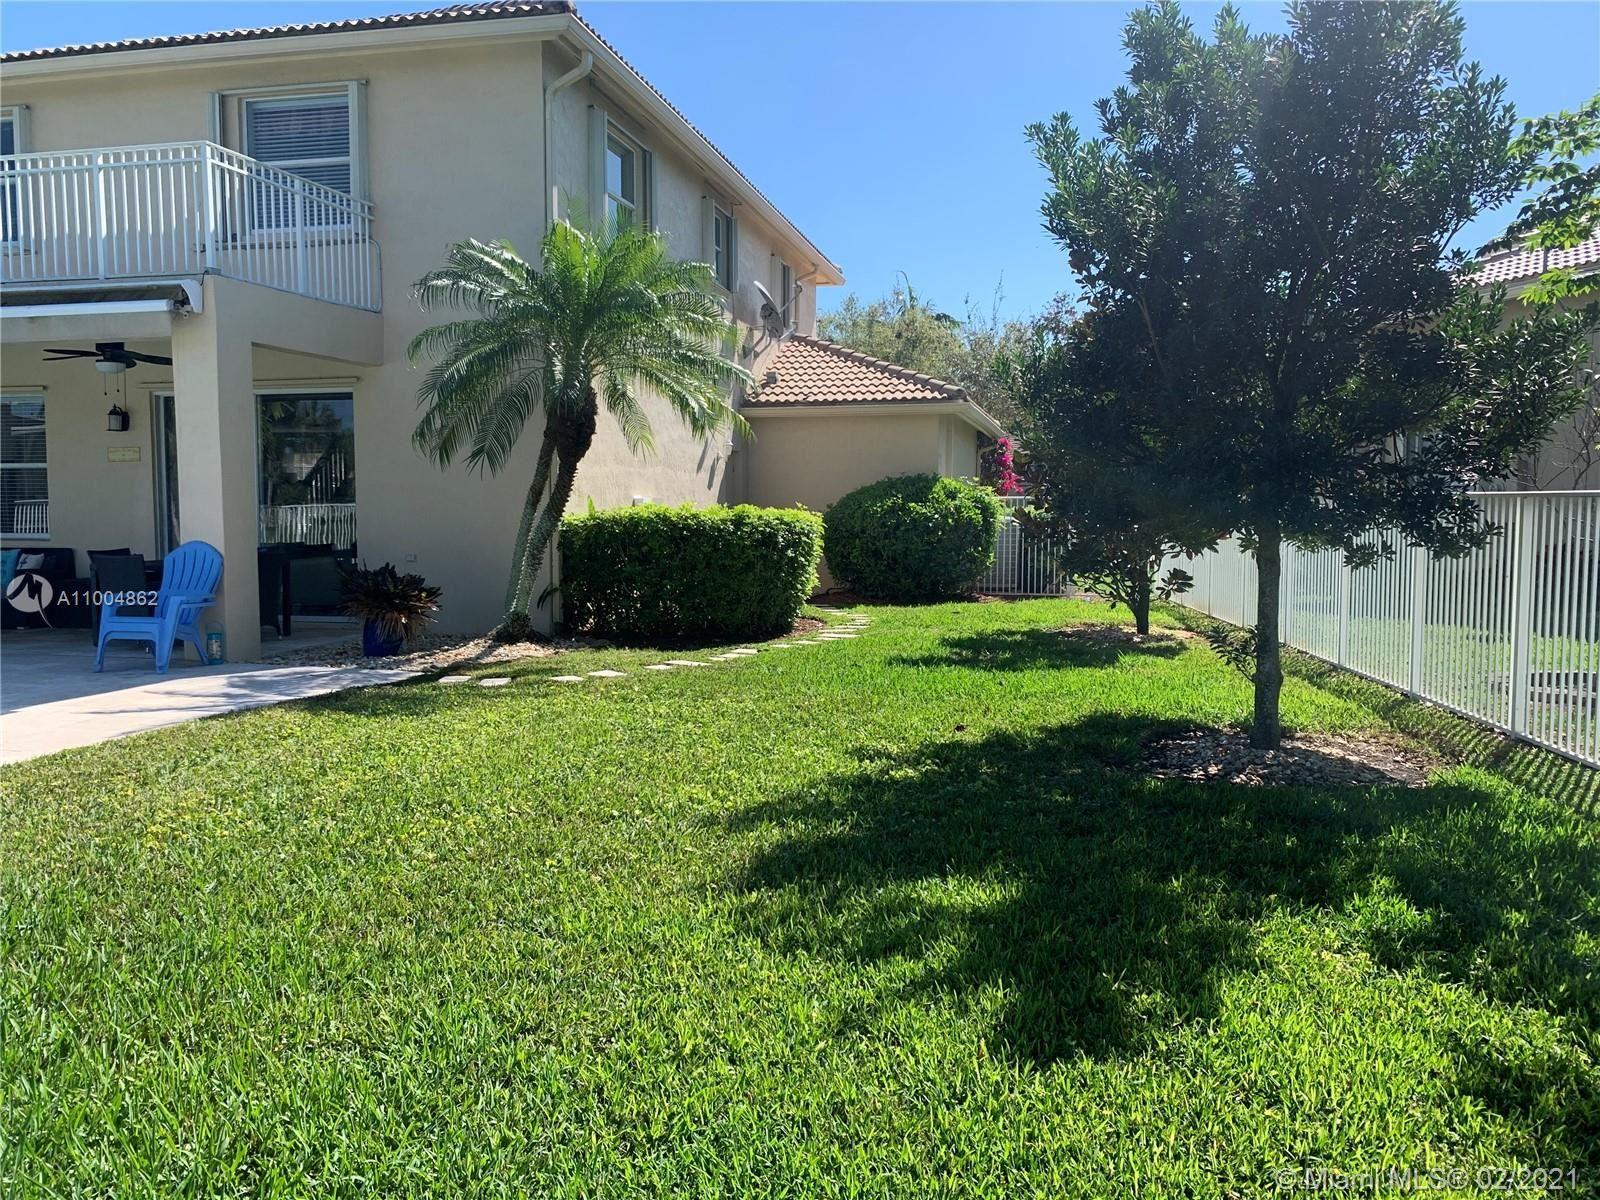 Photo of 4303 Diamond Row, Weston, FL 33331 (MLS # A11004862)